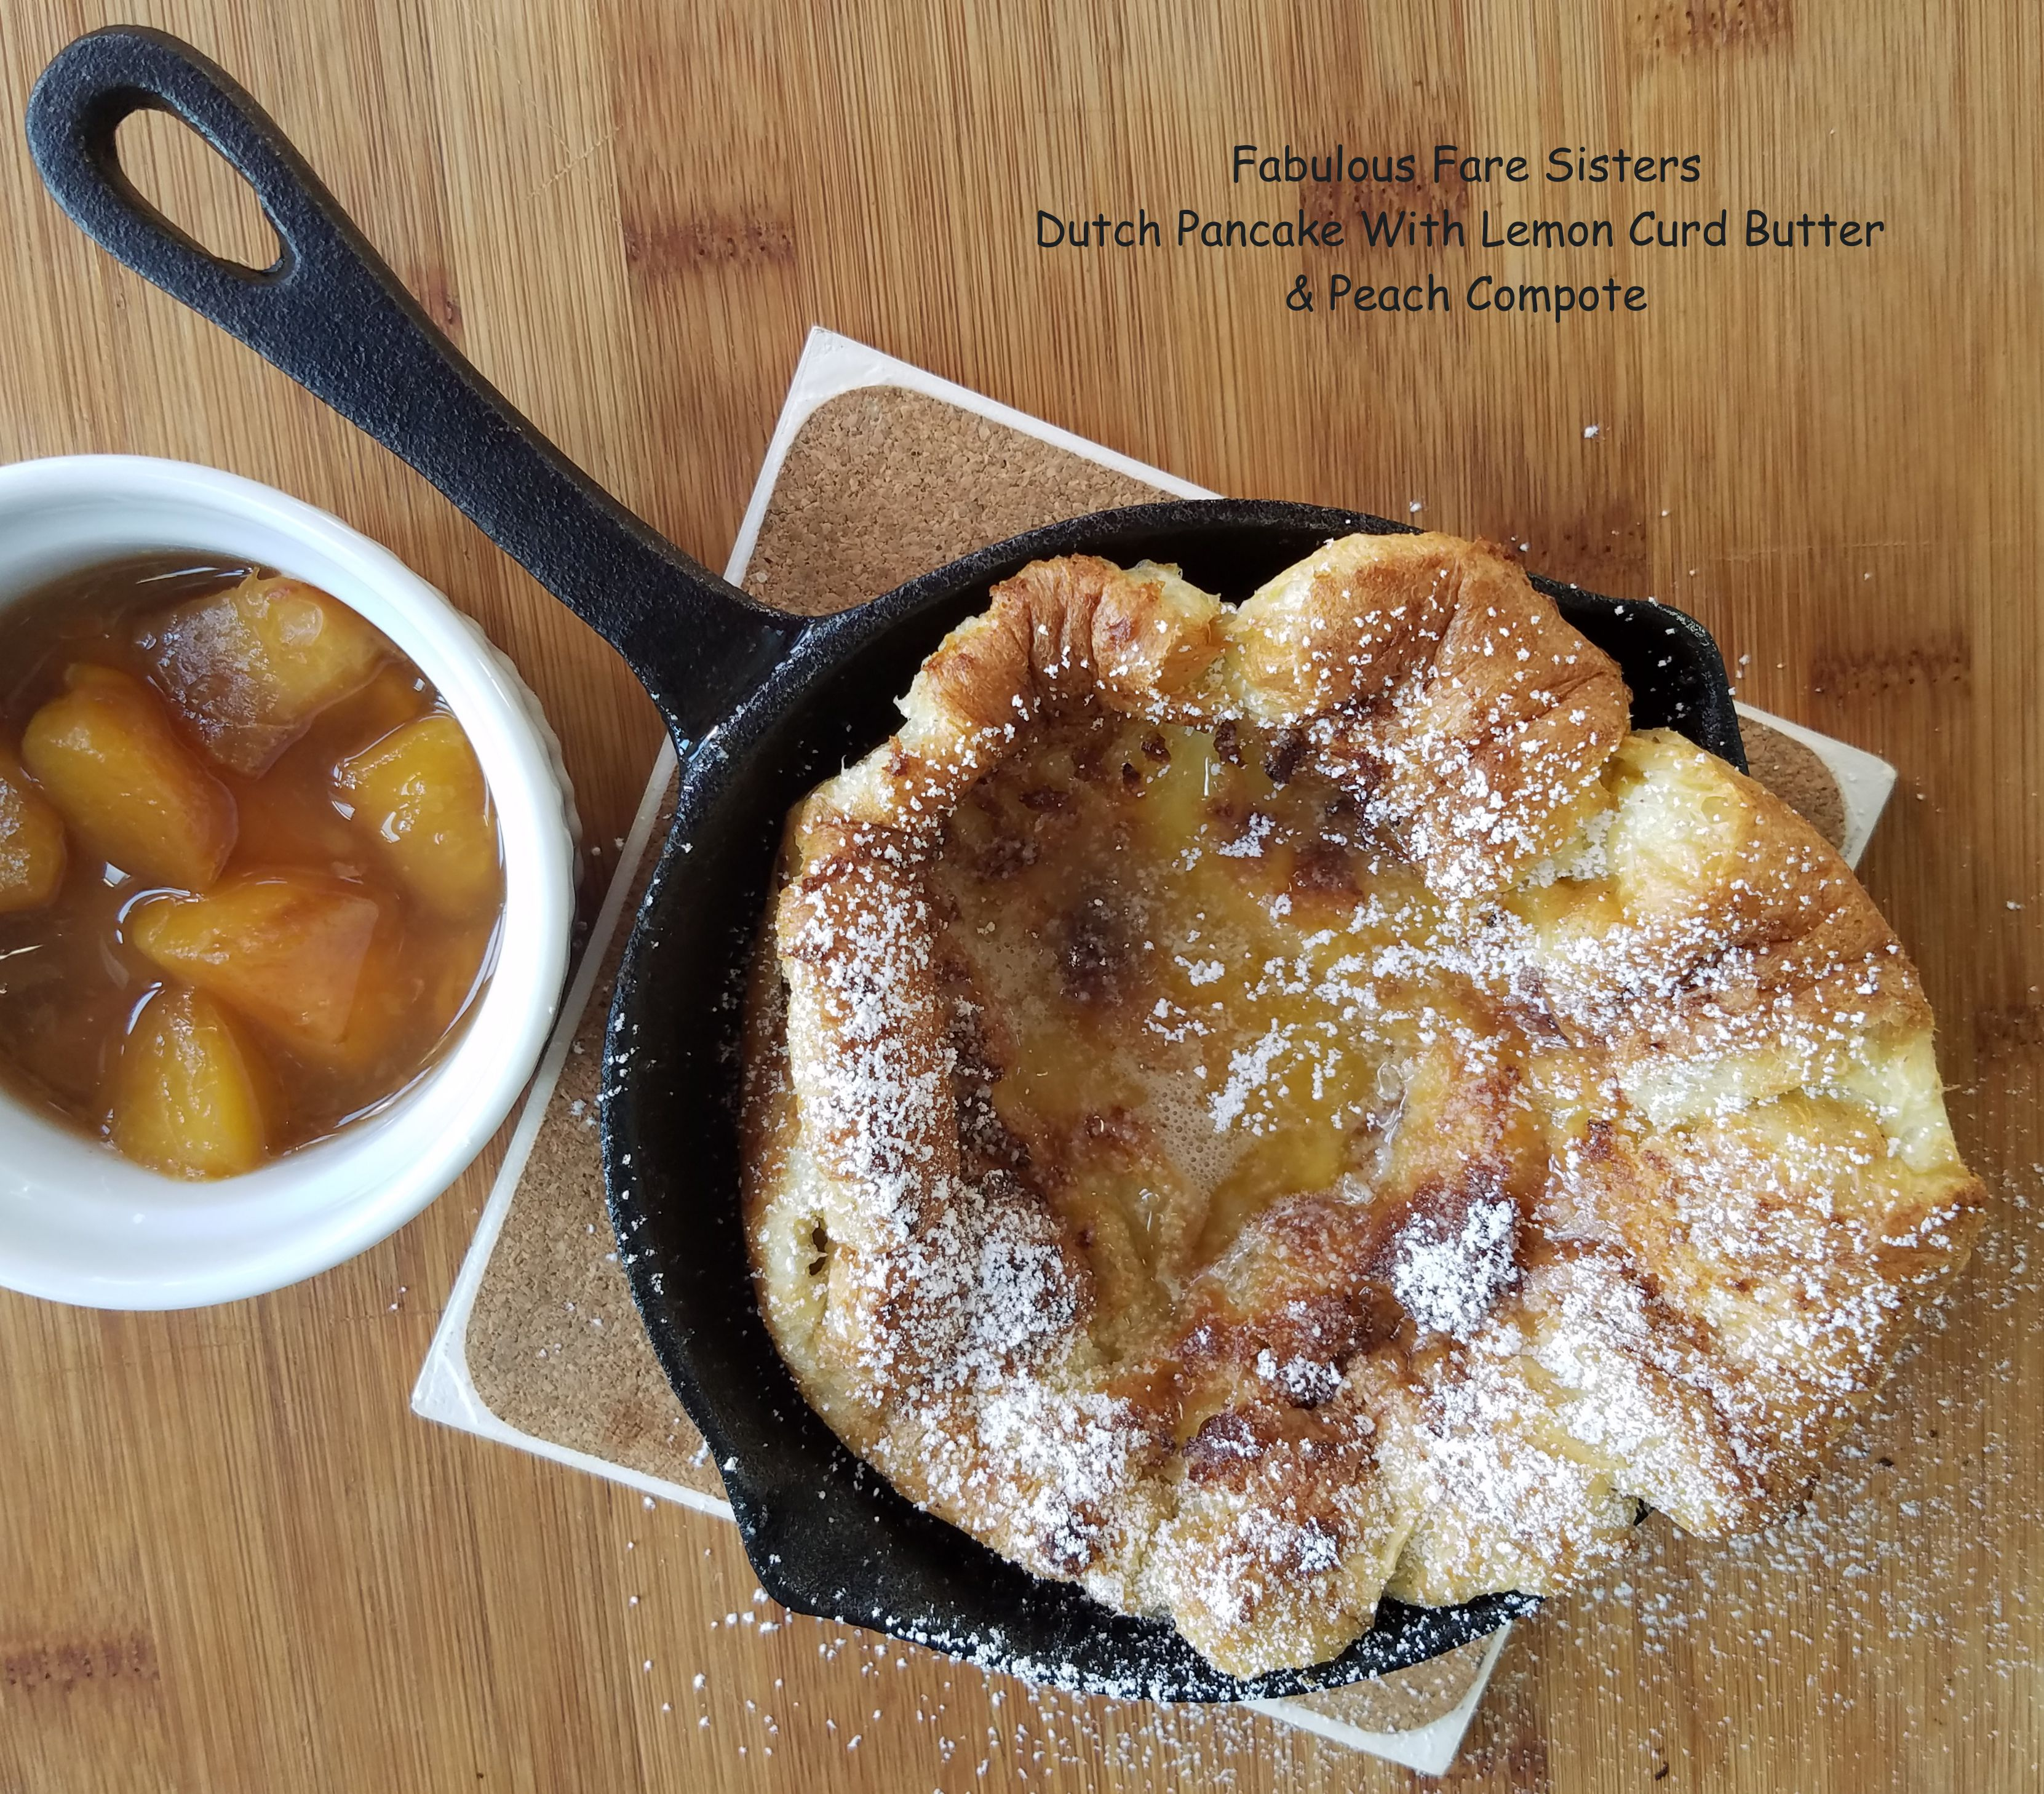 Dutch Pancake With Lemon Curd Butter & Peach Compote